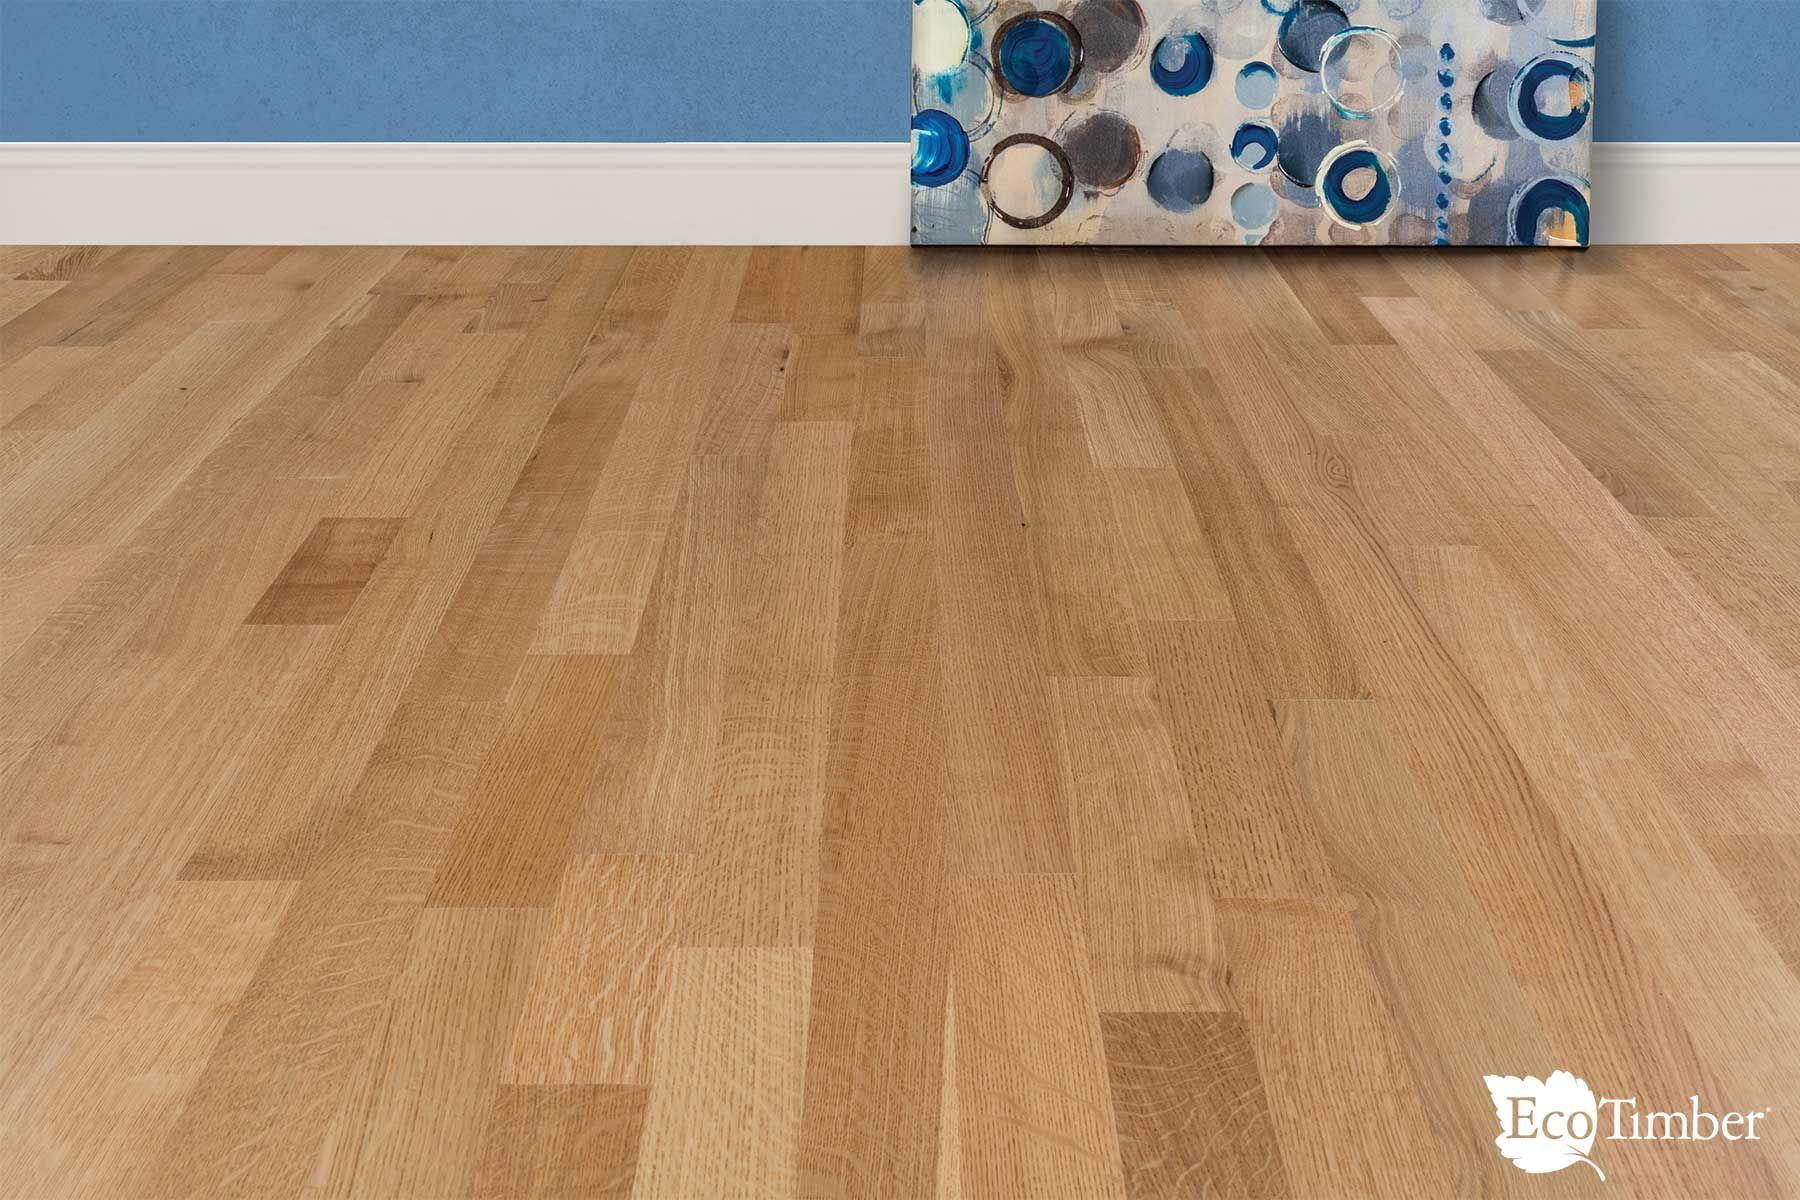 Tesoro Woods, Beautifully Sustainable Flooring  Wood, Bamboo And Cork